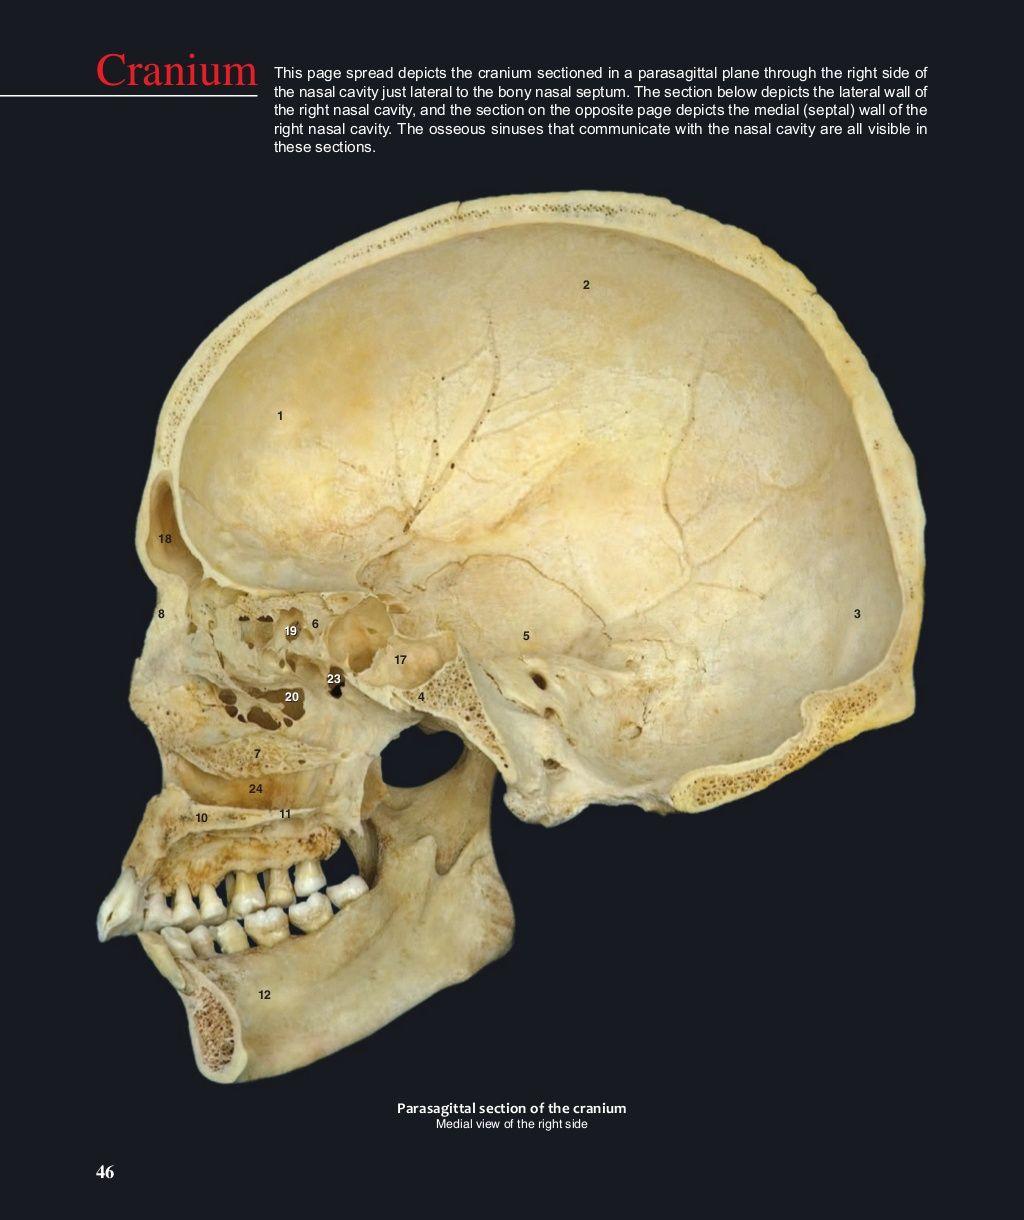 47 1 Frontal Bone 2 Parietal Bone 3 Occipital Bone 4 Sphenoid Bone 5